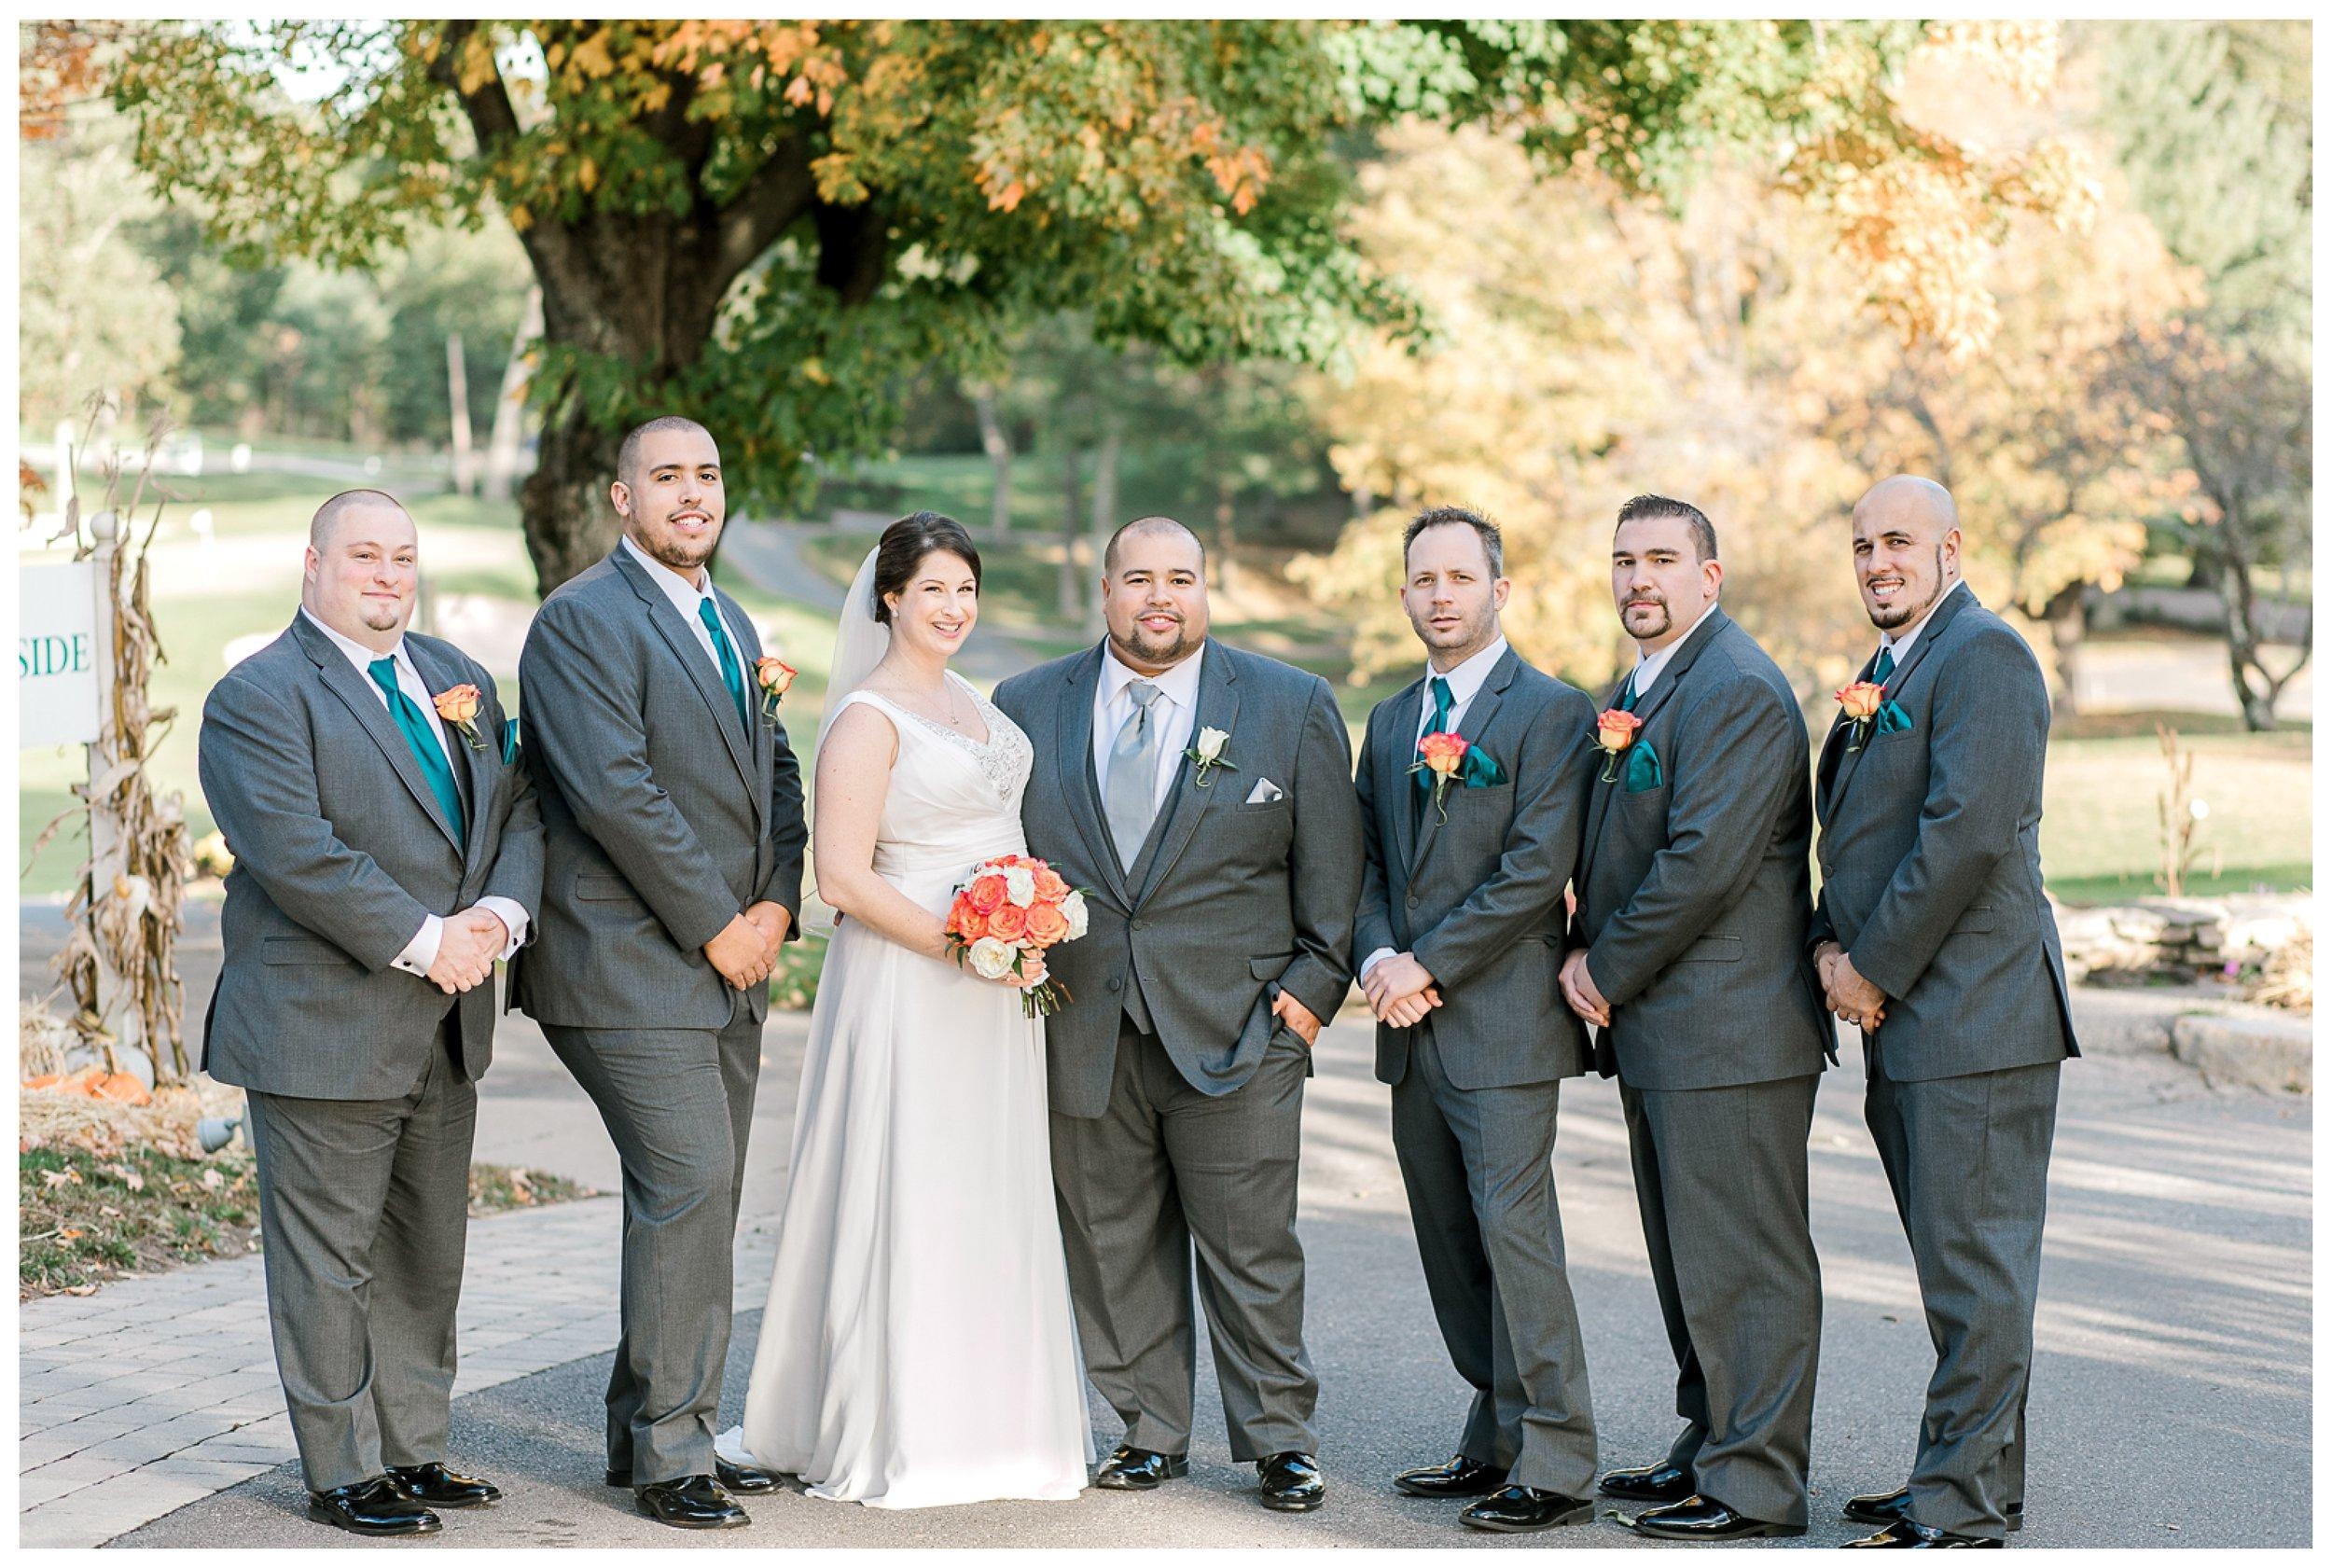 pleasant_valley_country_club_wedding_sutton_erica_pezente_photography (27).jpg